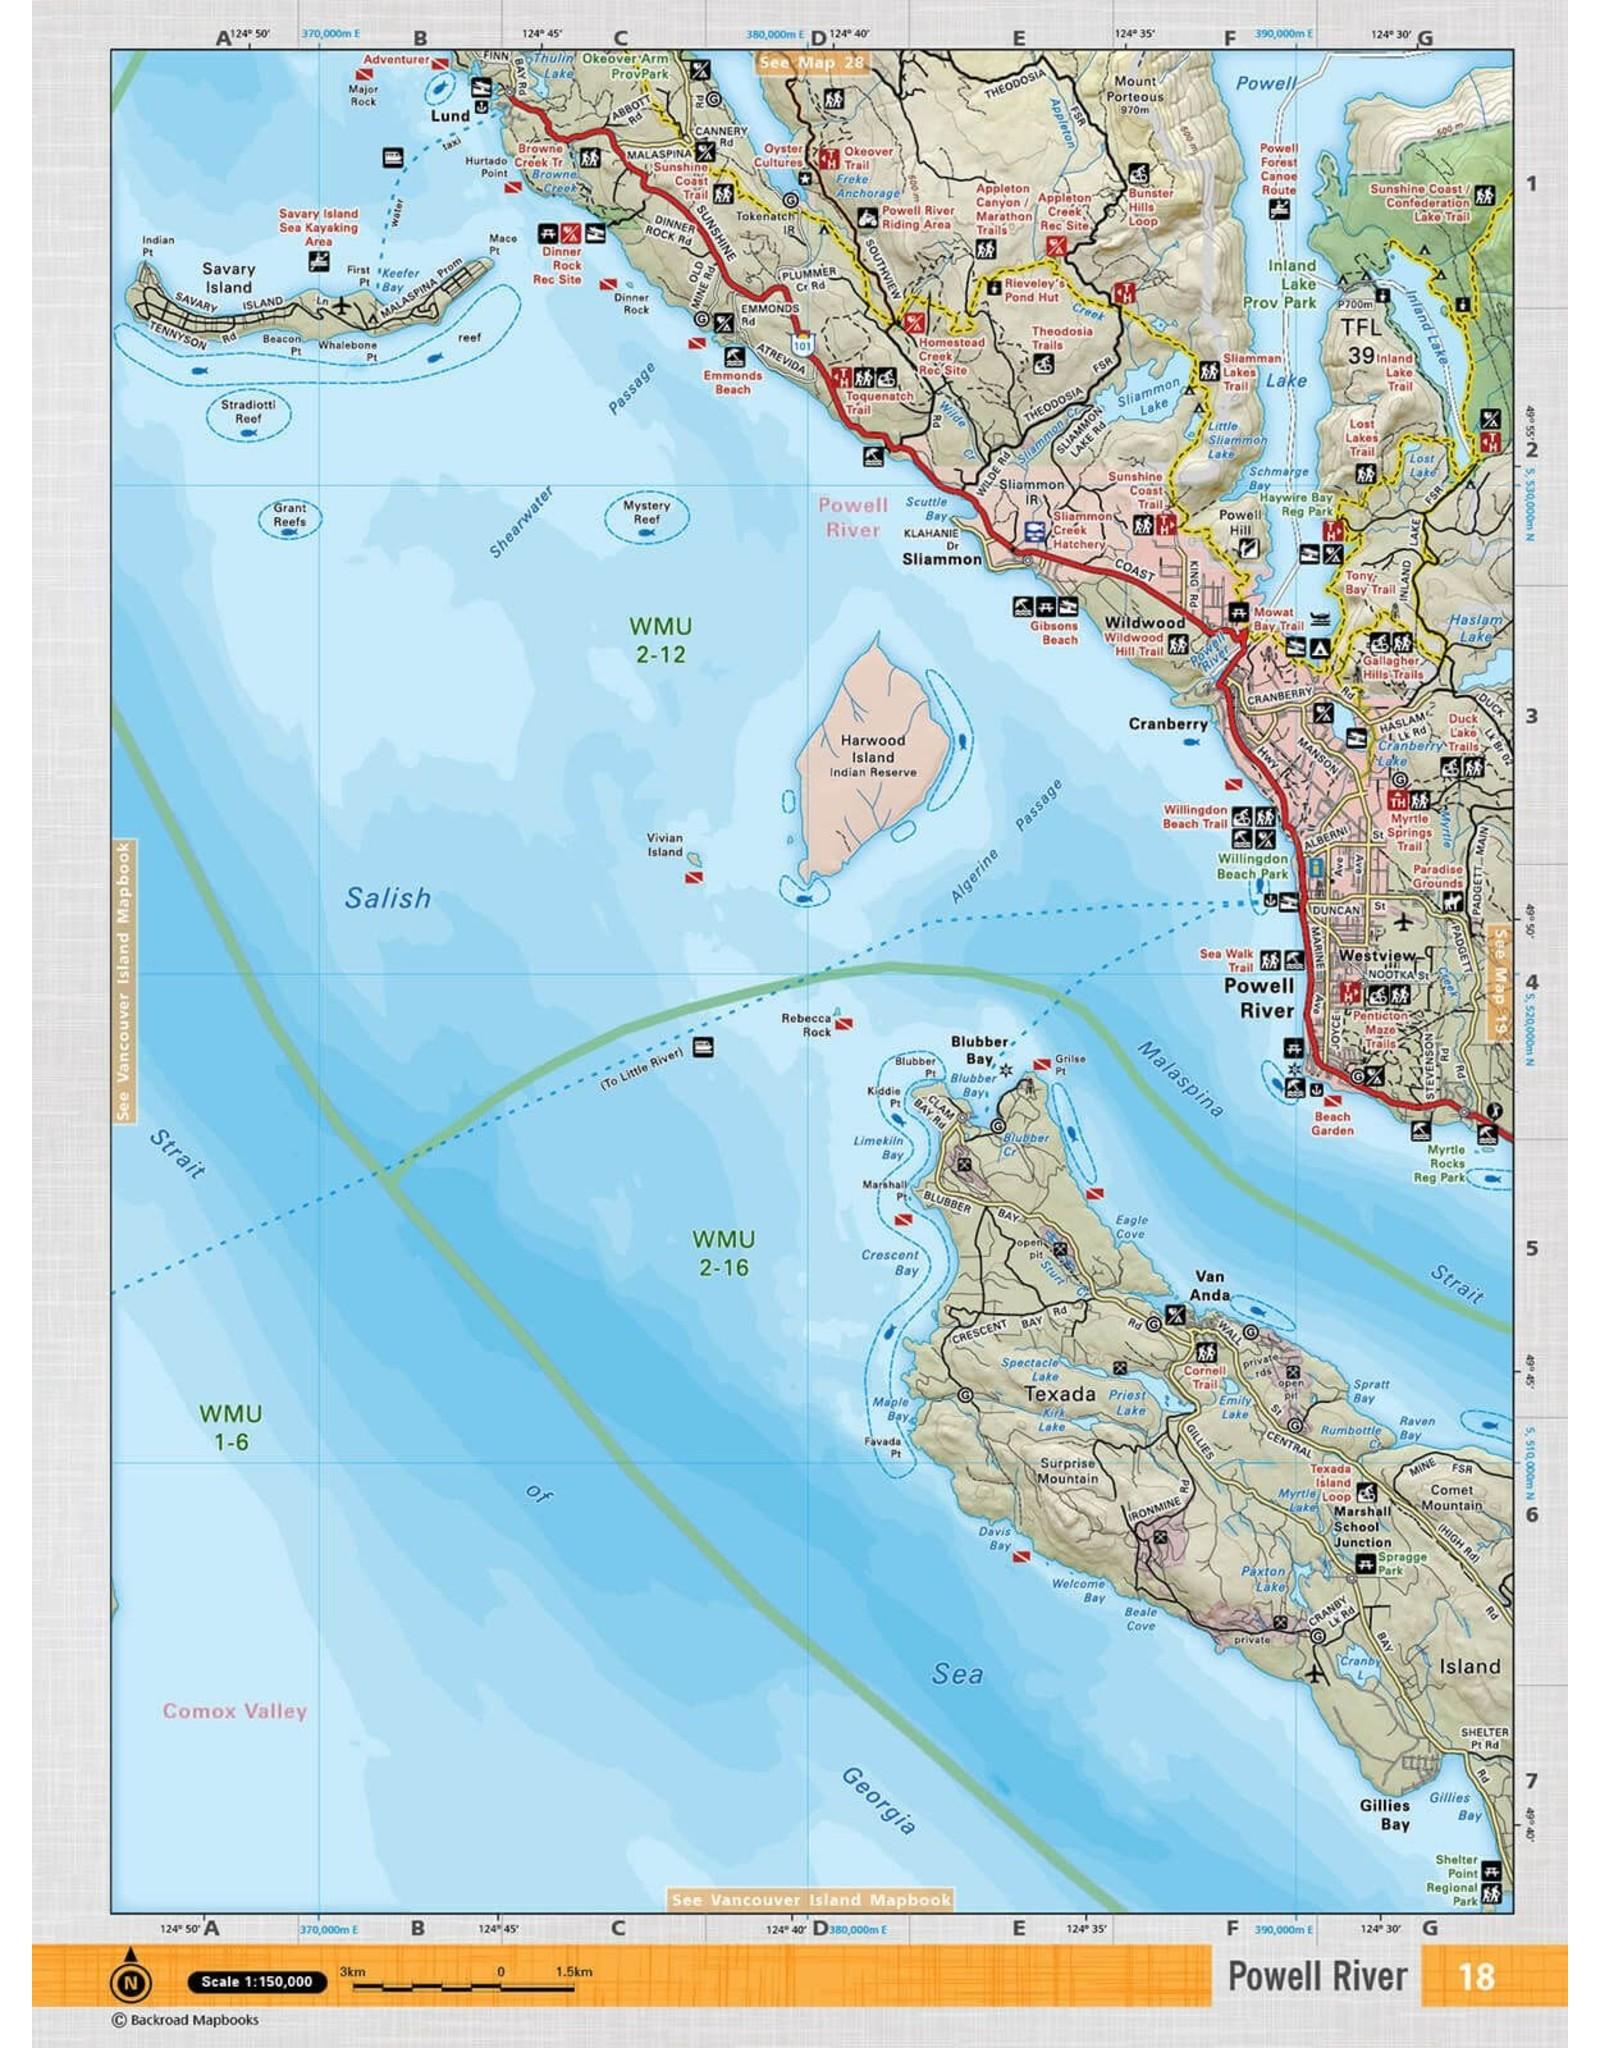 BACKROAD MAPBOOKS BRMB - VCBC18 - POWELL RIVER (WATERPROOF)